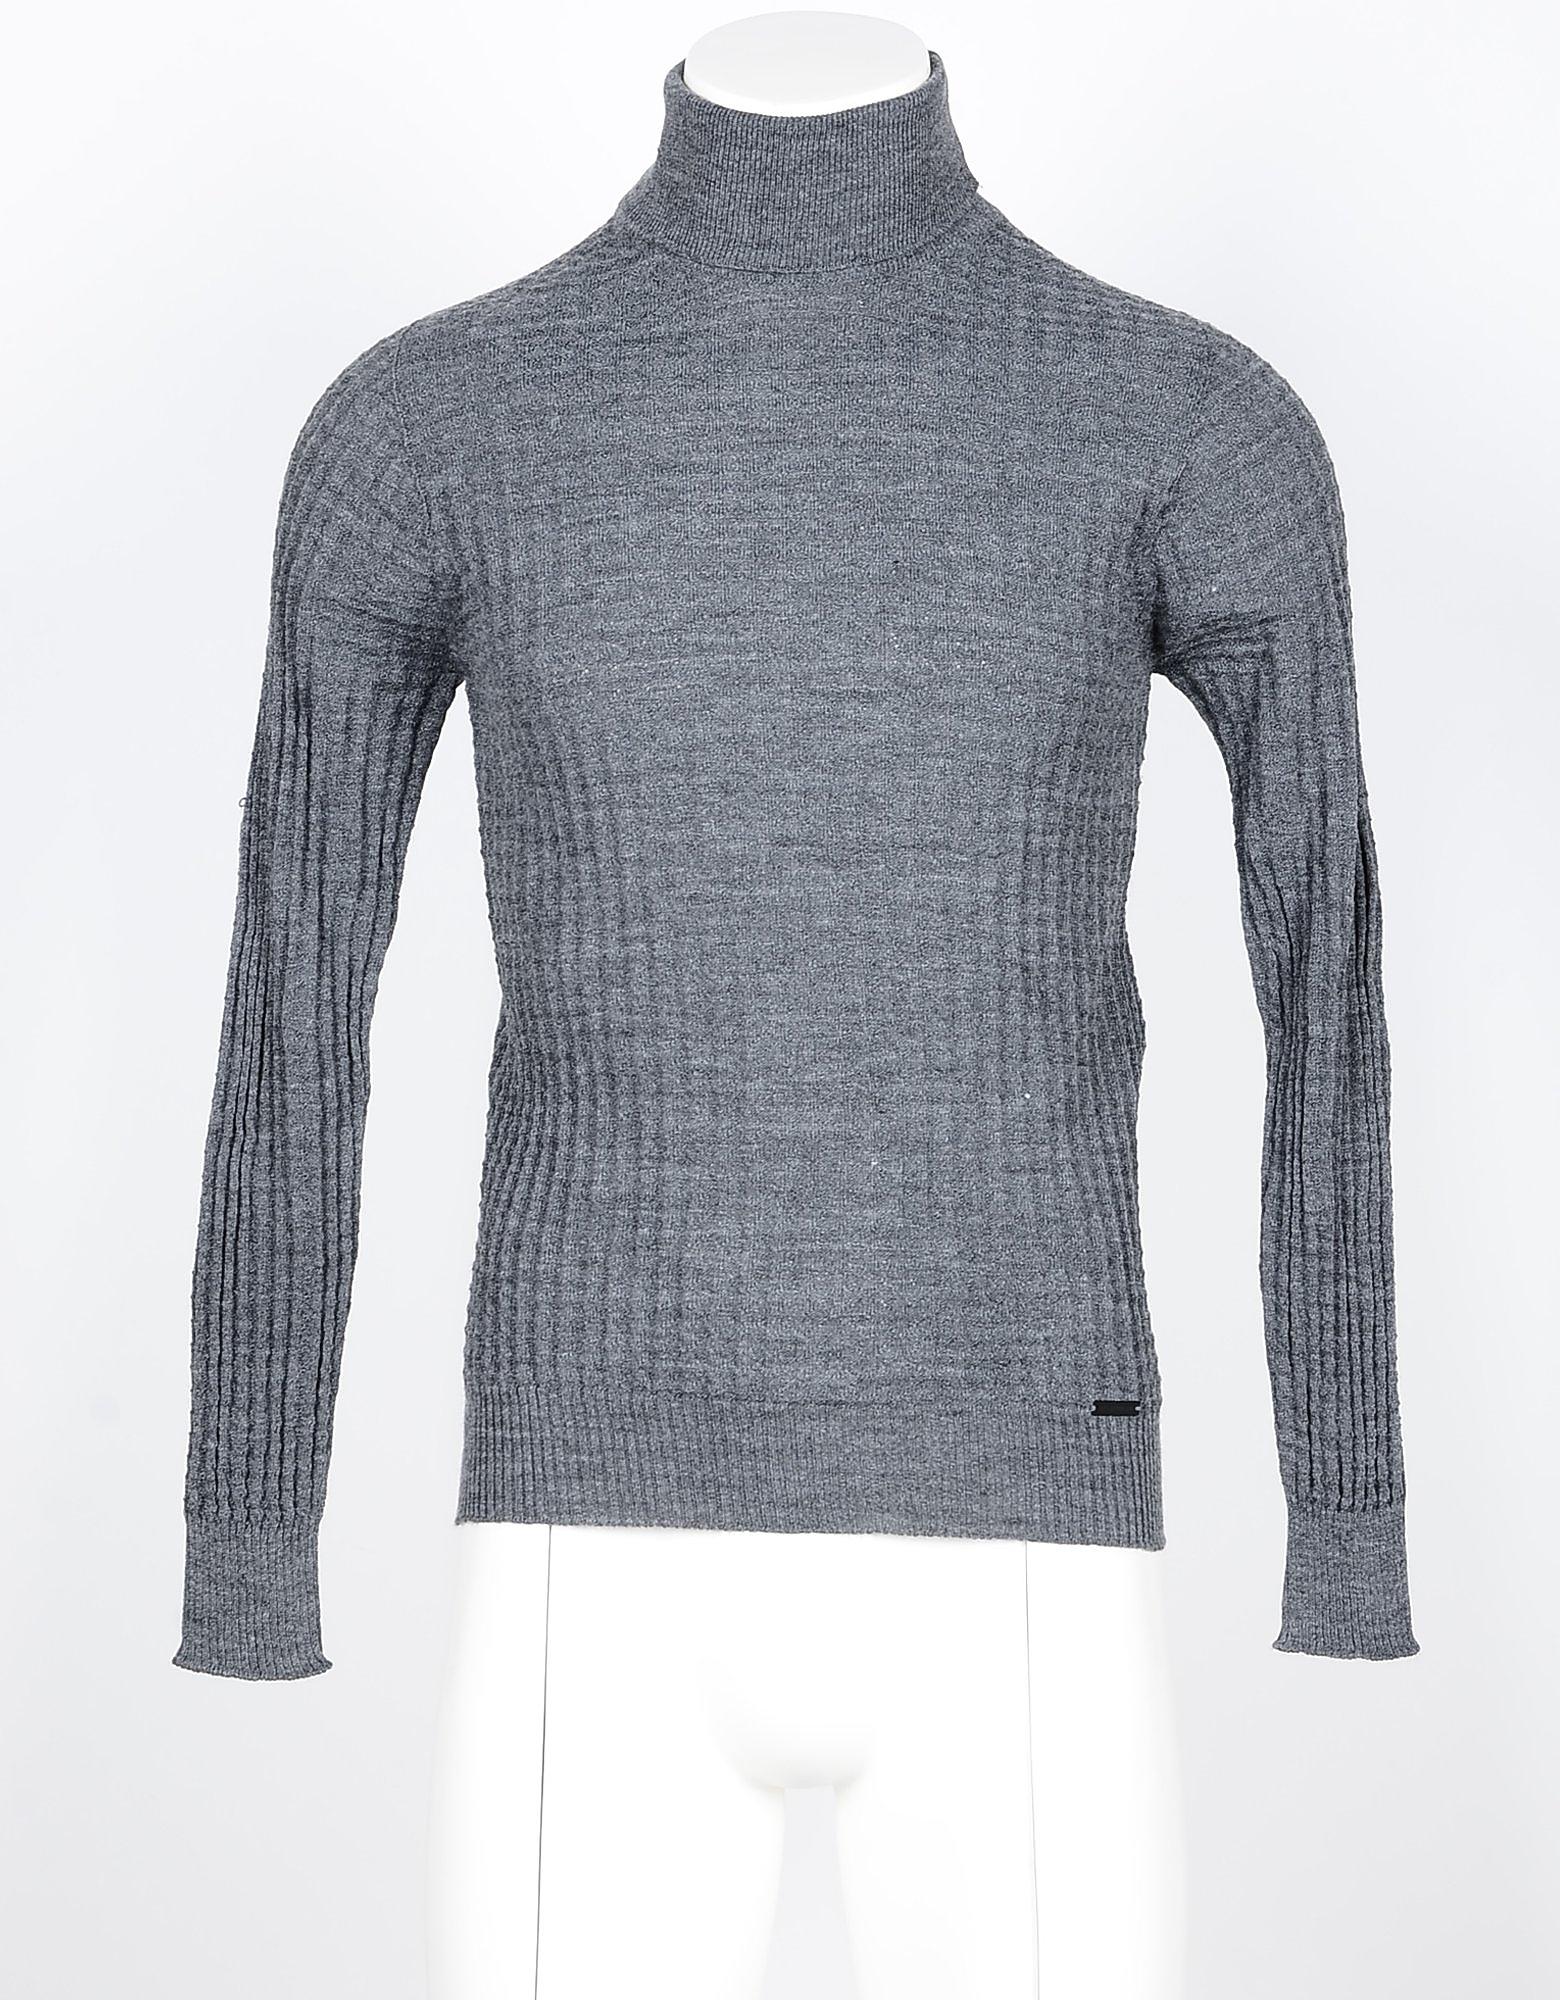 Takeshy Kurosawa Knitwear, Gray Blue Men's Turtleneck Sweater